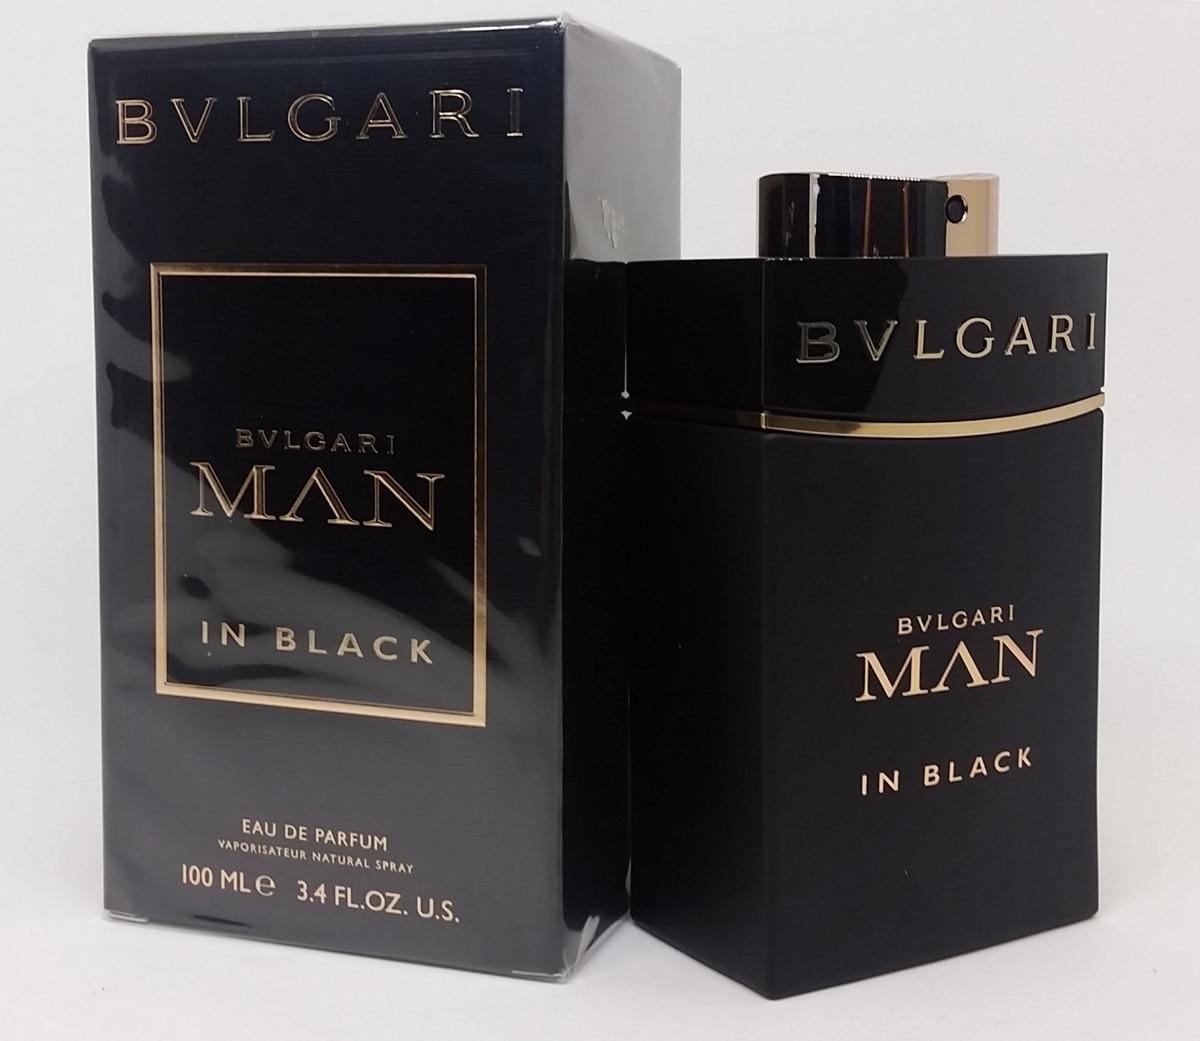 4a0f7295f50 bvlgari man in black 100 ml edp masculino original. Carregando zoom.